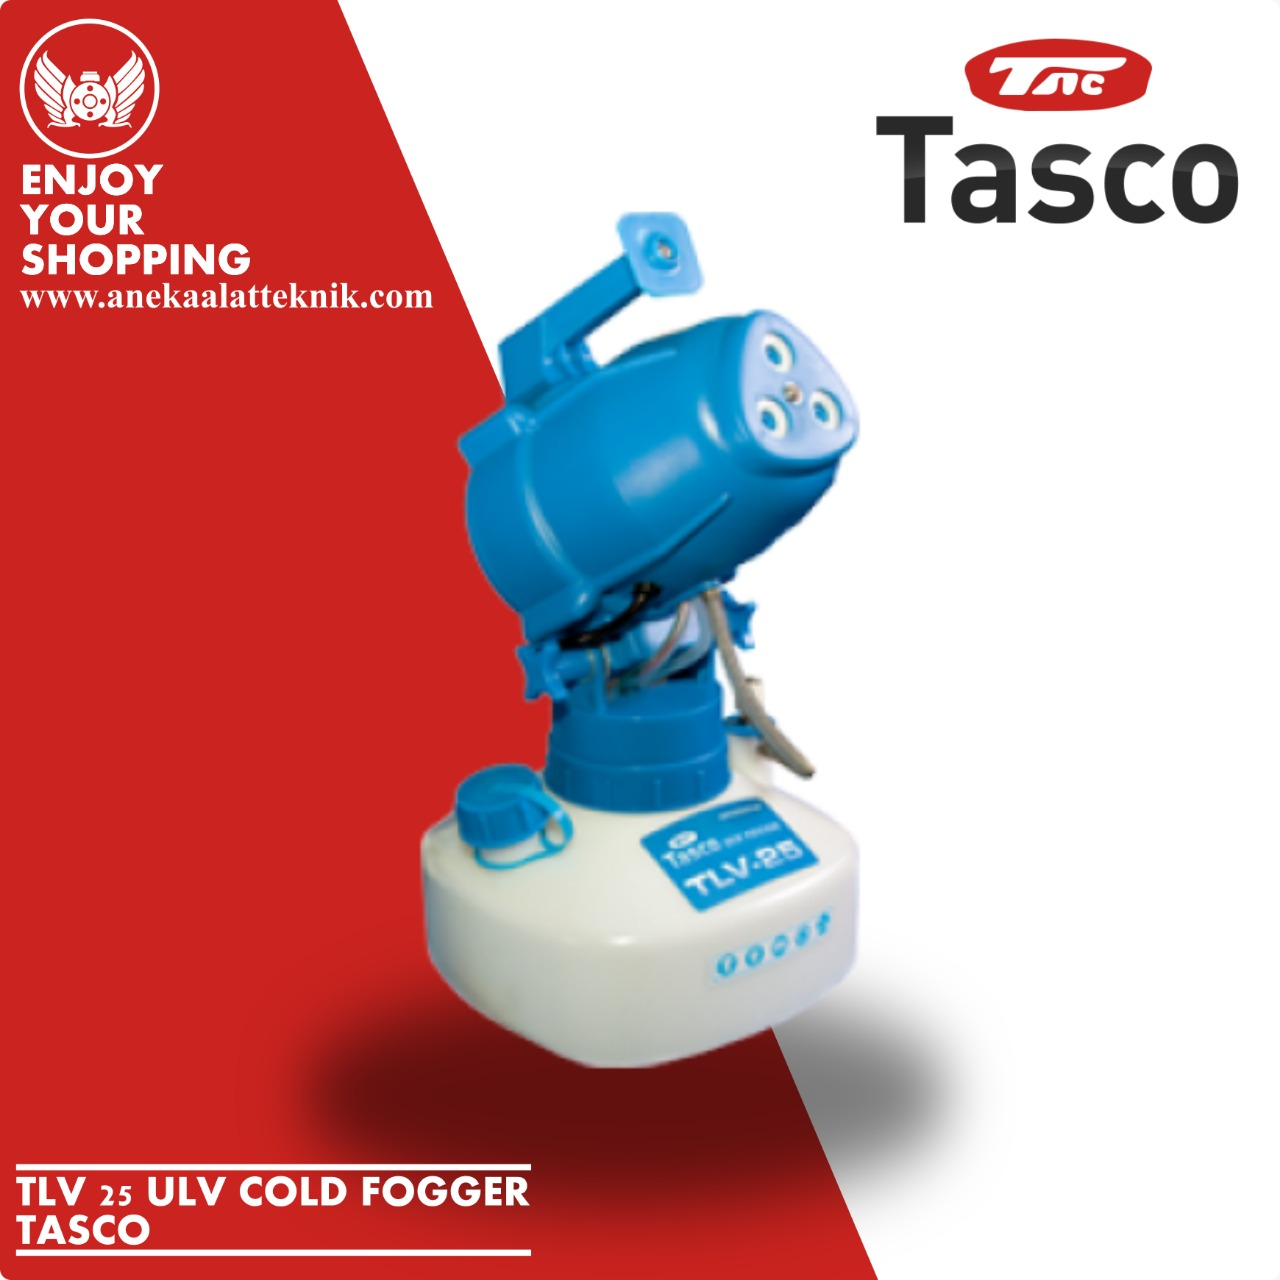 Jual Mesin Fogging Tasco TLV 25